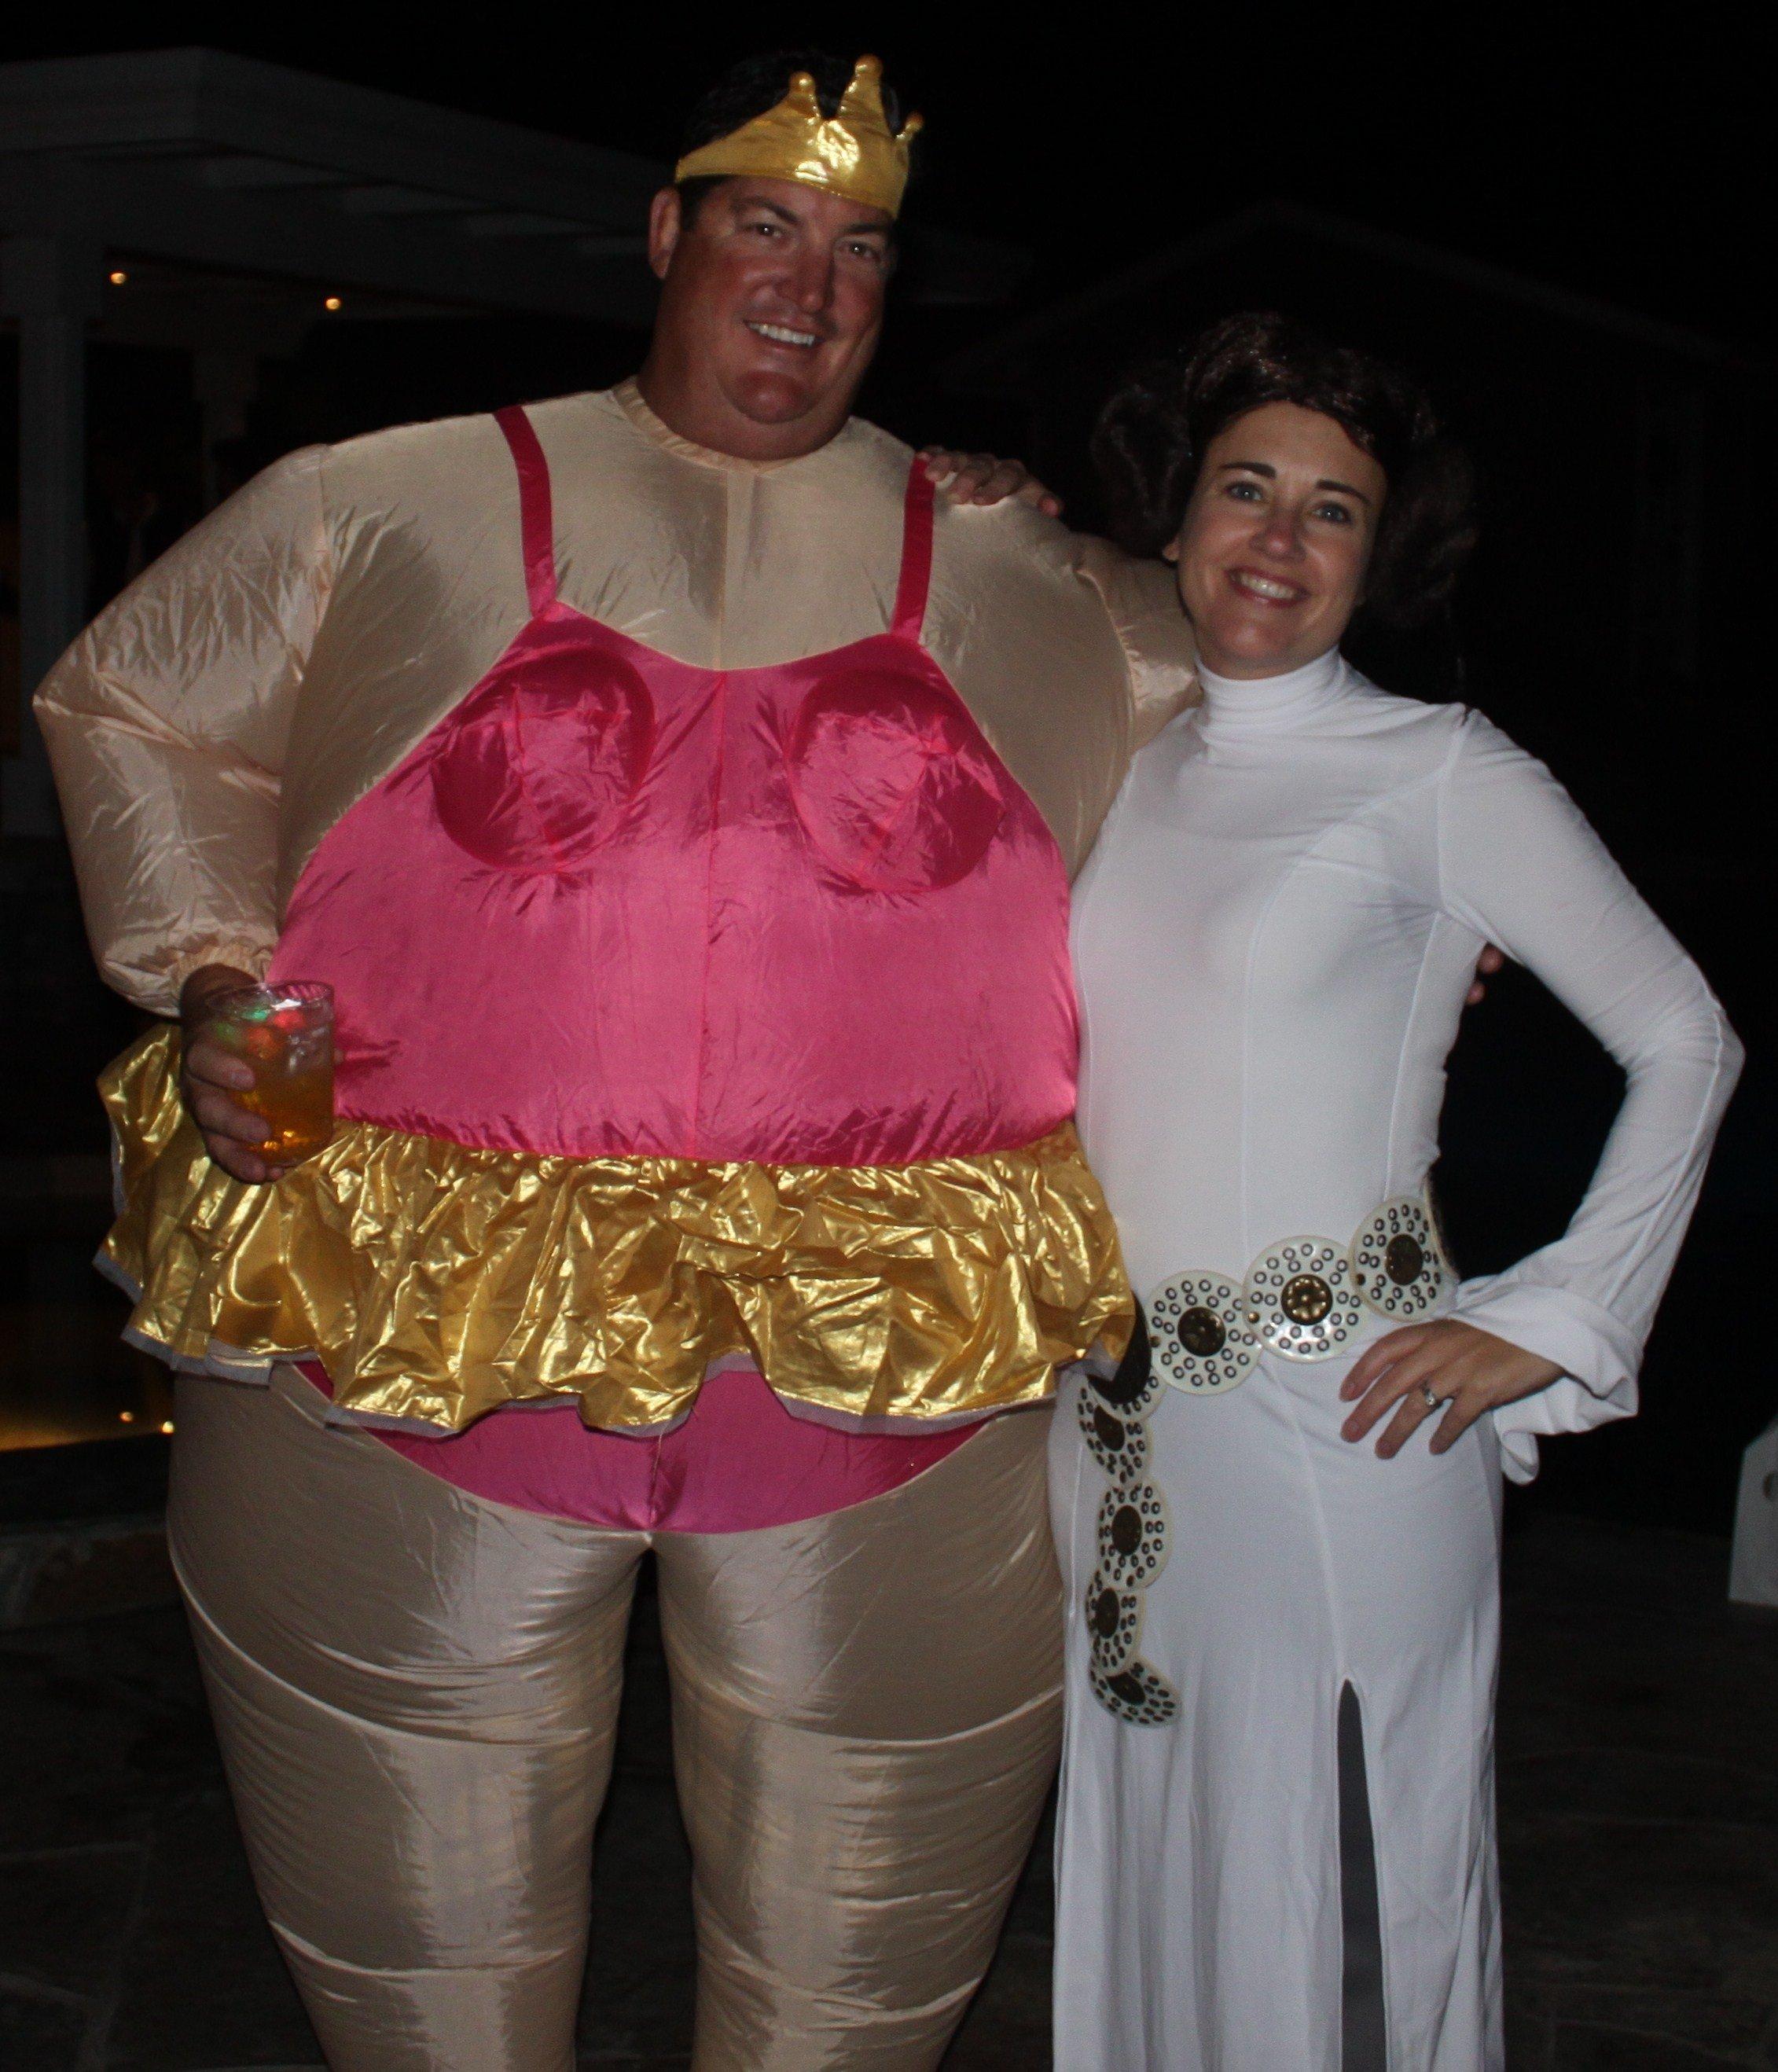 10 Wonderful Halloween Costume Ideas For Black People halloween costume ideas 6 2021